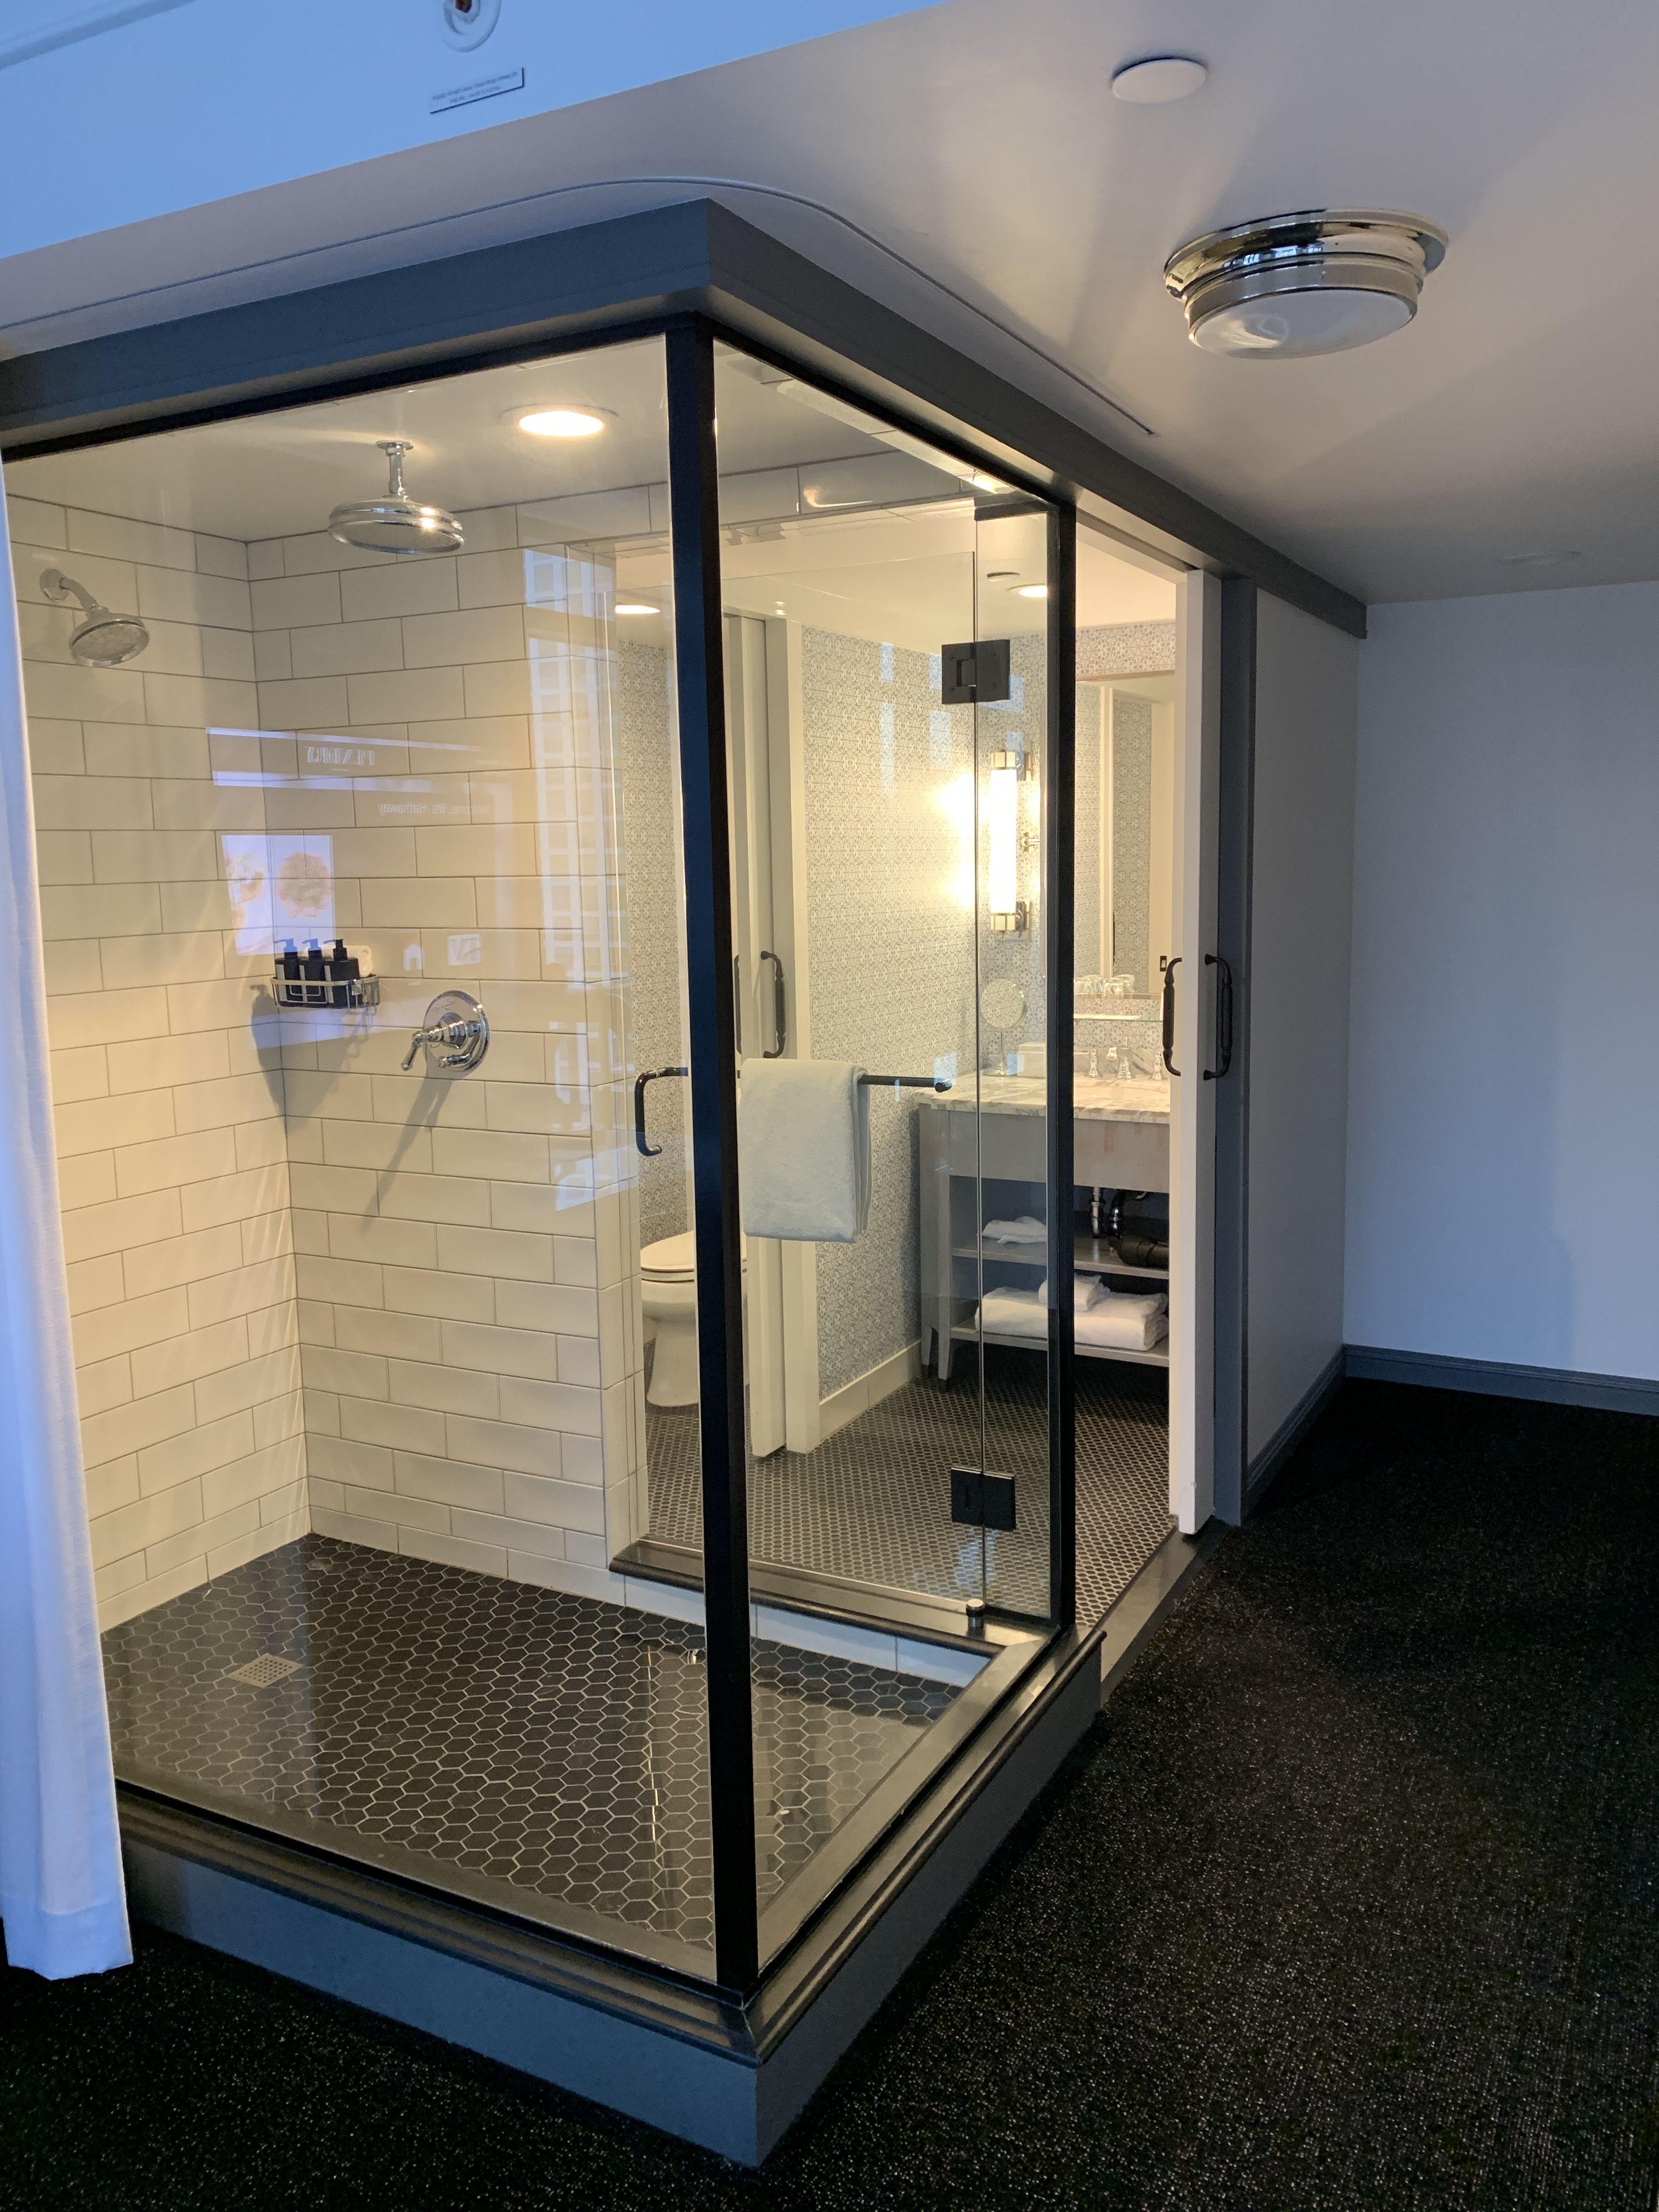 39+ San diego bathroom design ideas